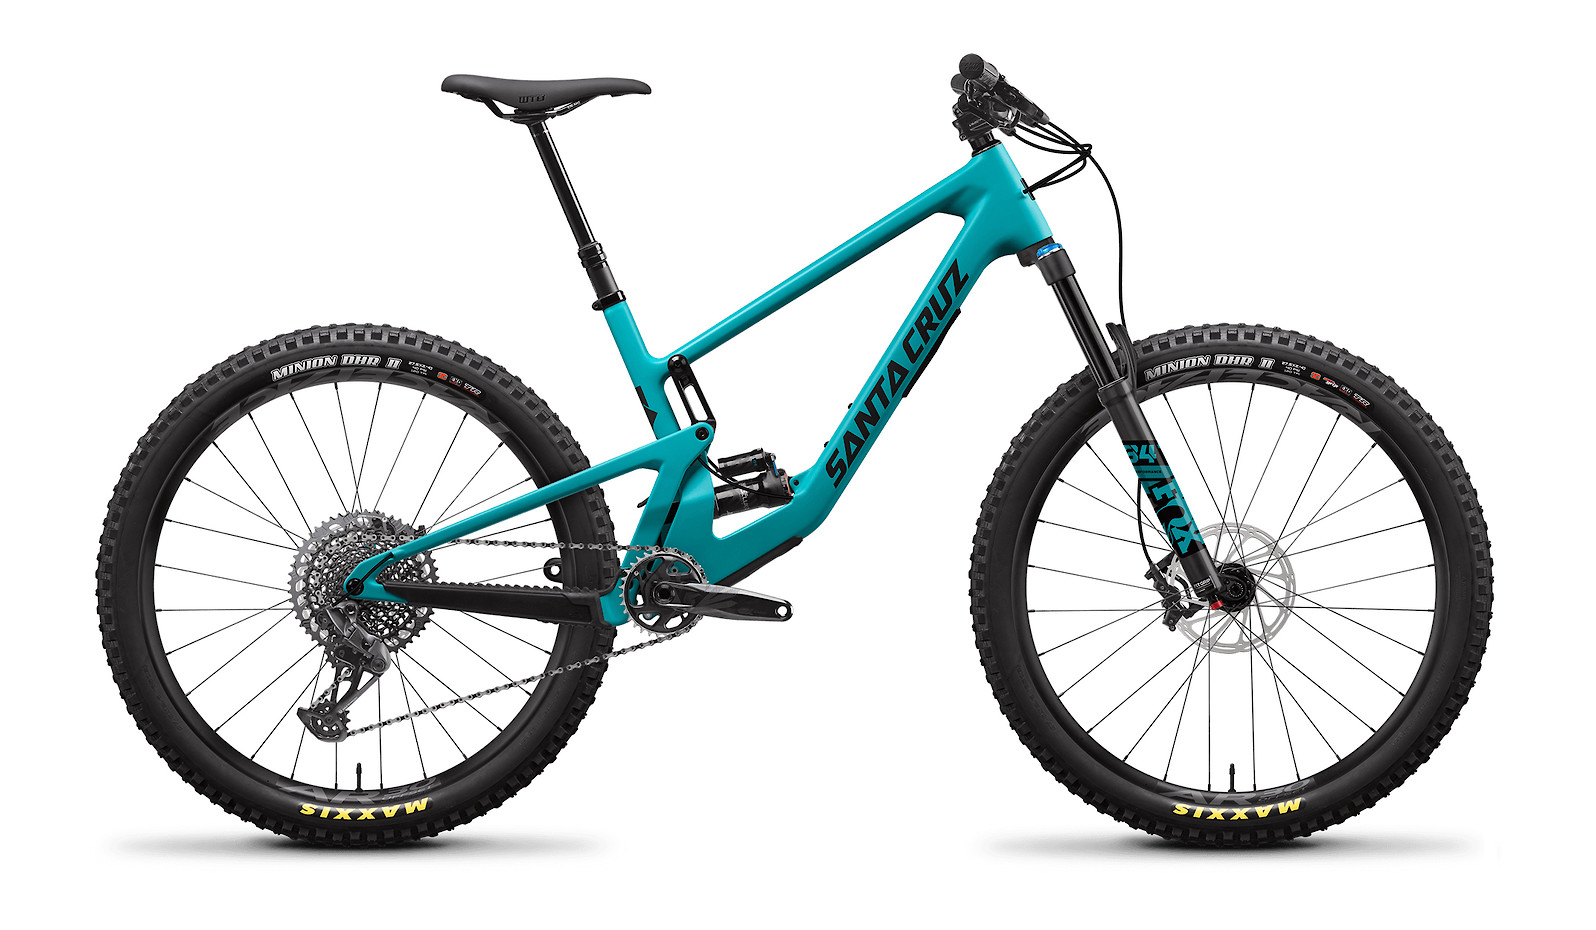 2021 Santa Cruz 5010 Carbon C S (Loosely Blue and Black)